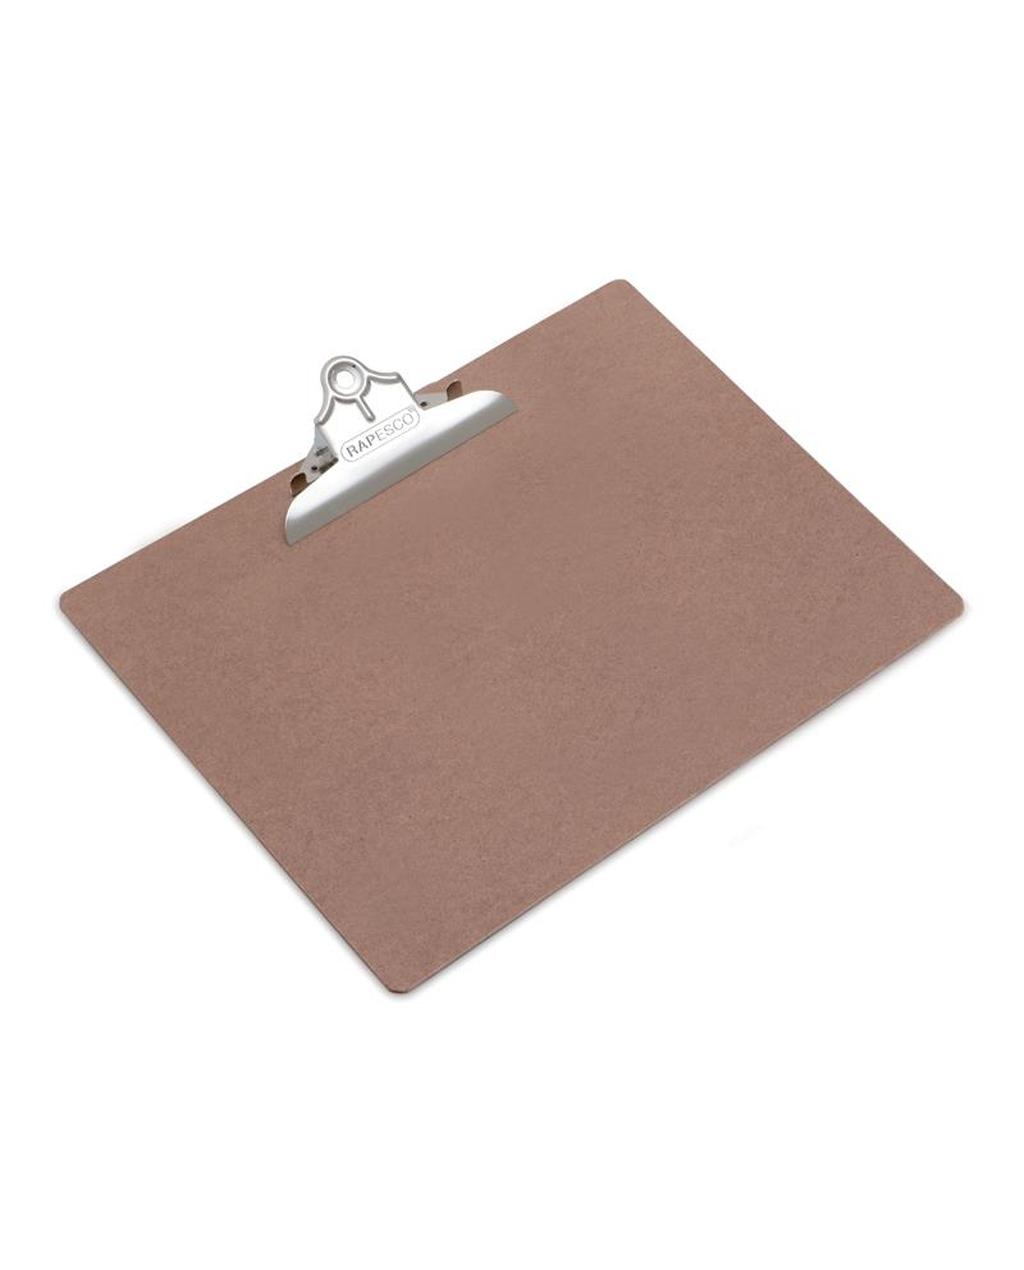 A3 Landscape Hardboard Clipboard